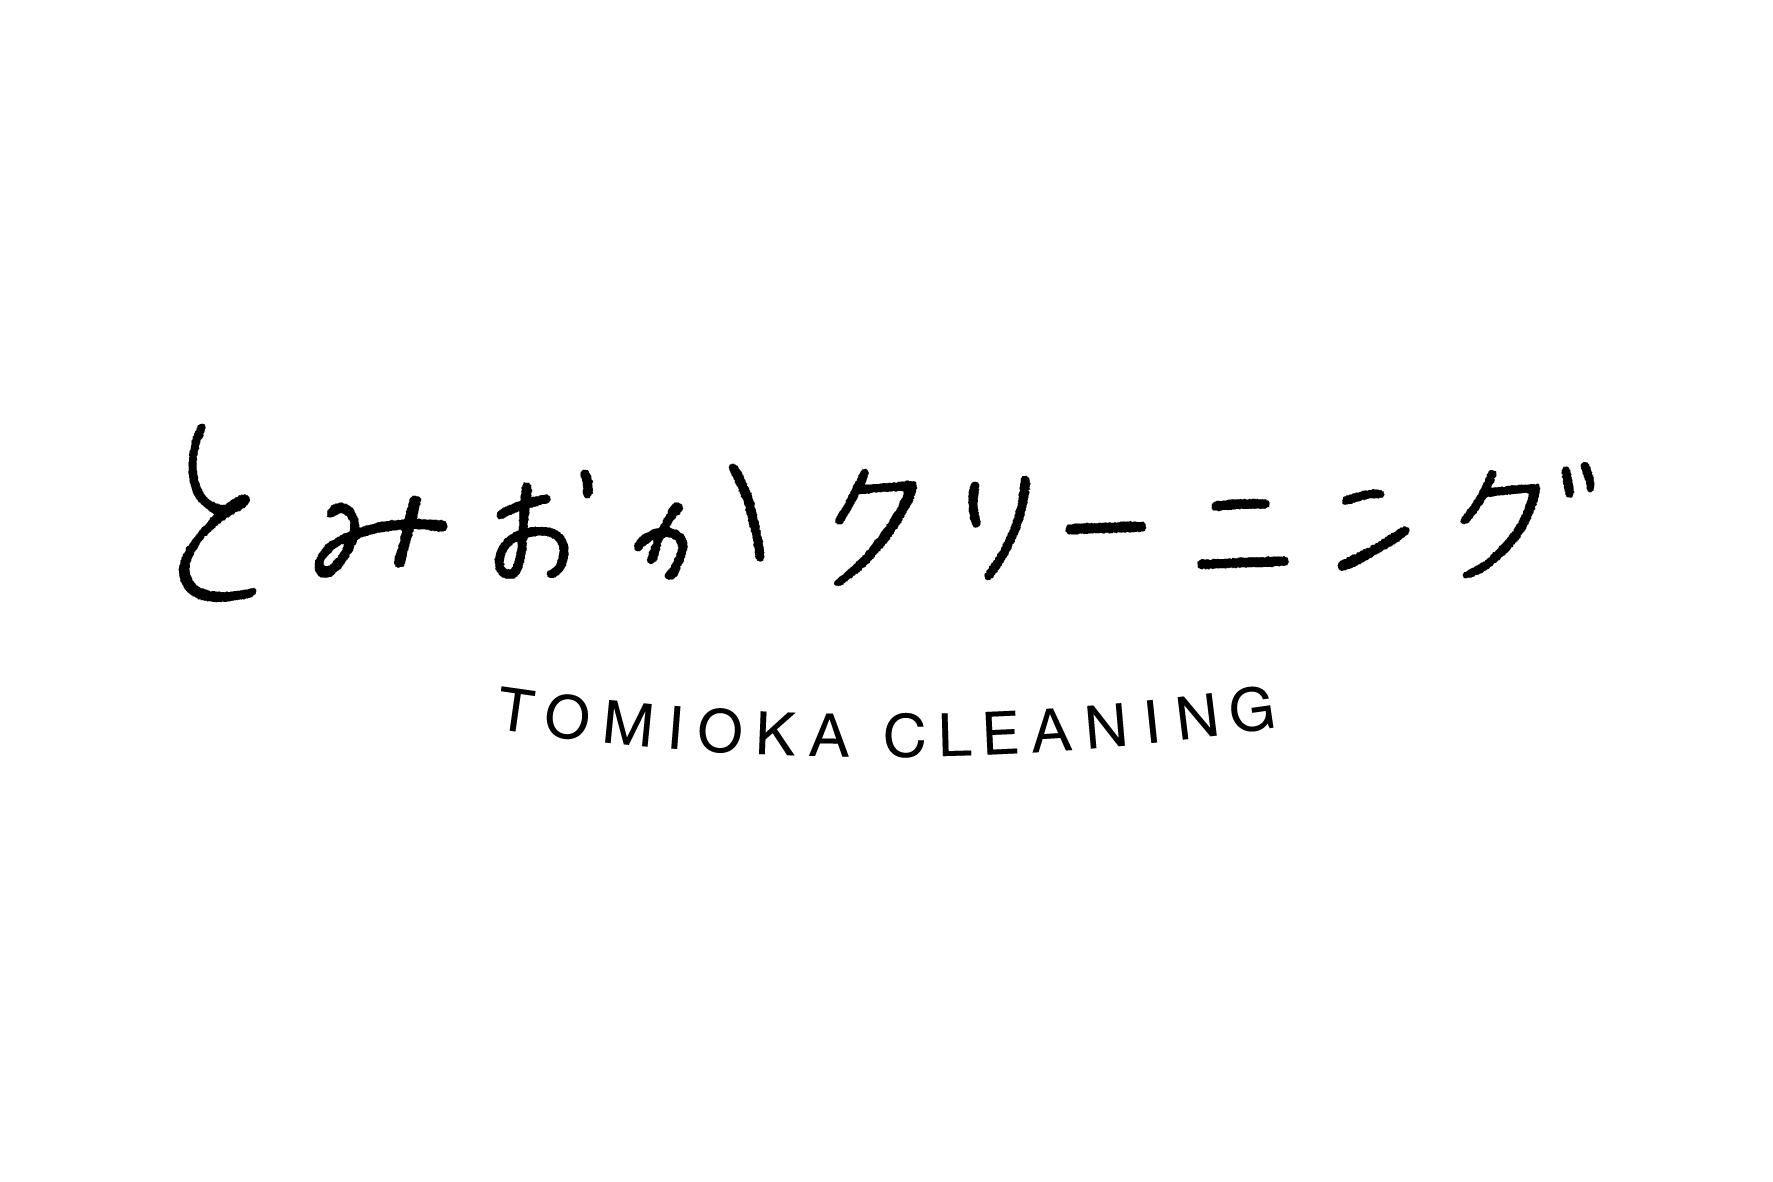 Tomioka Cleaning